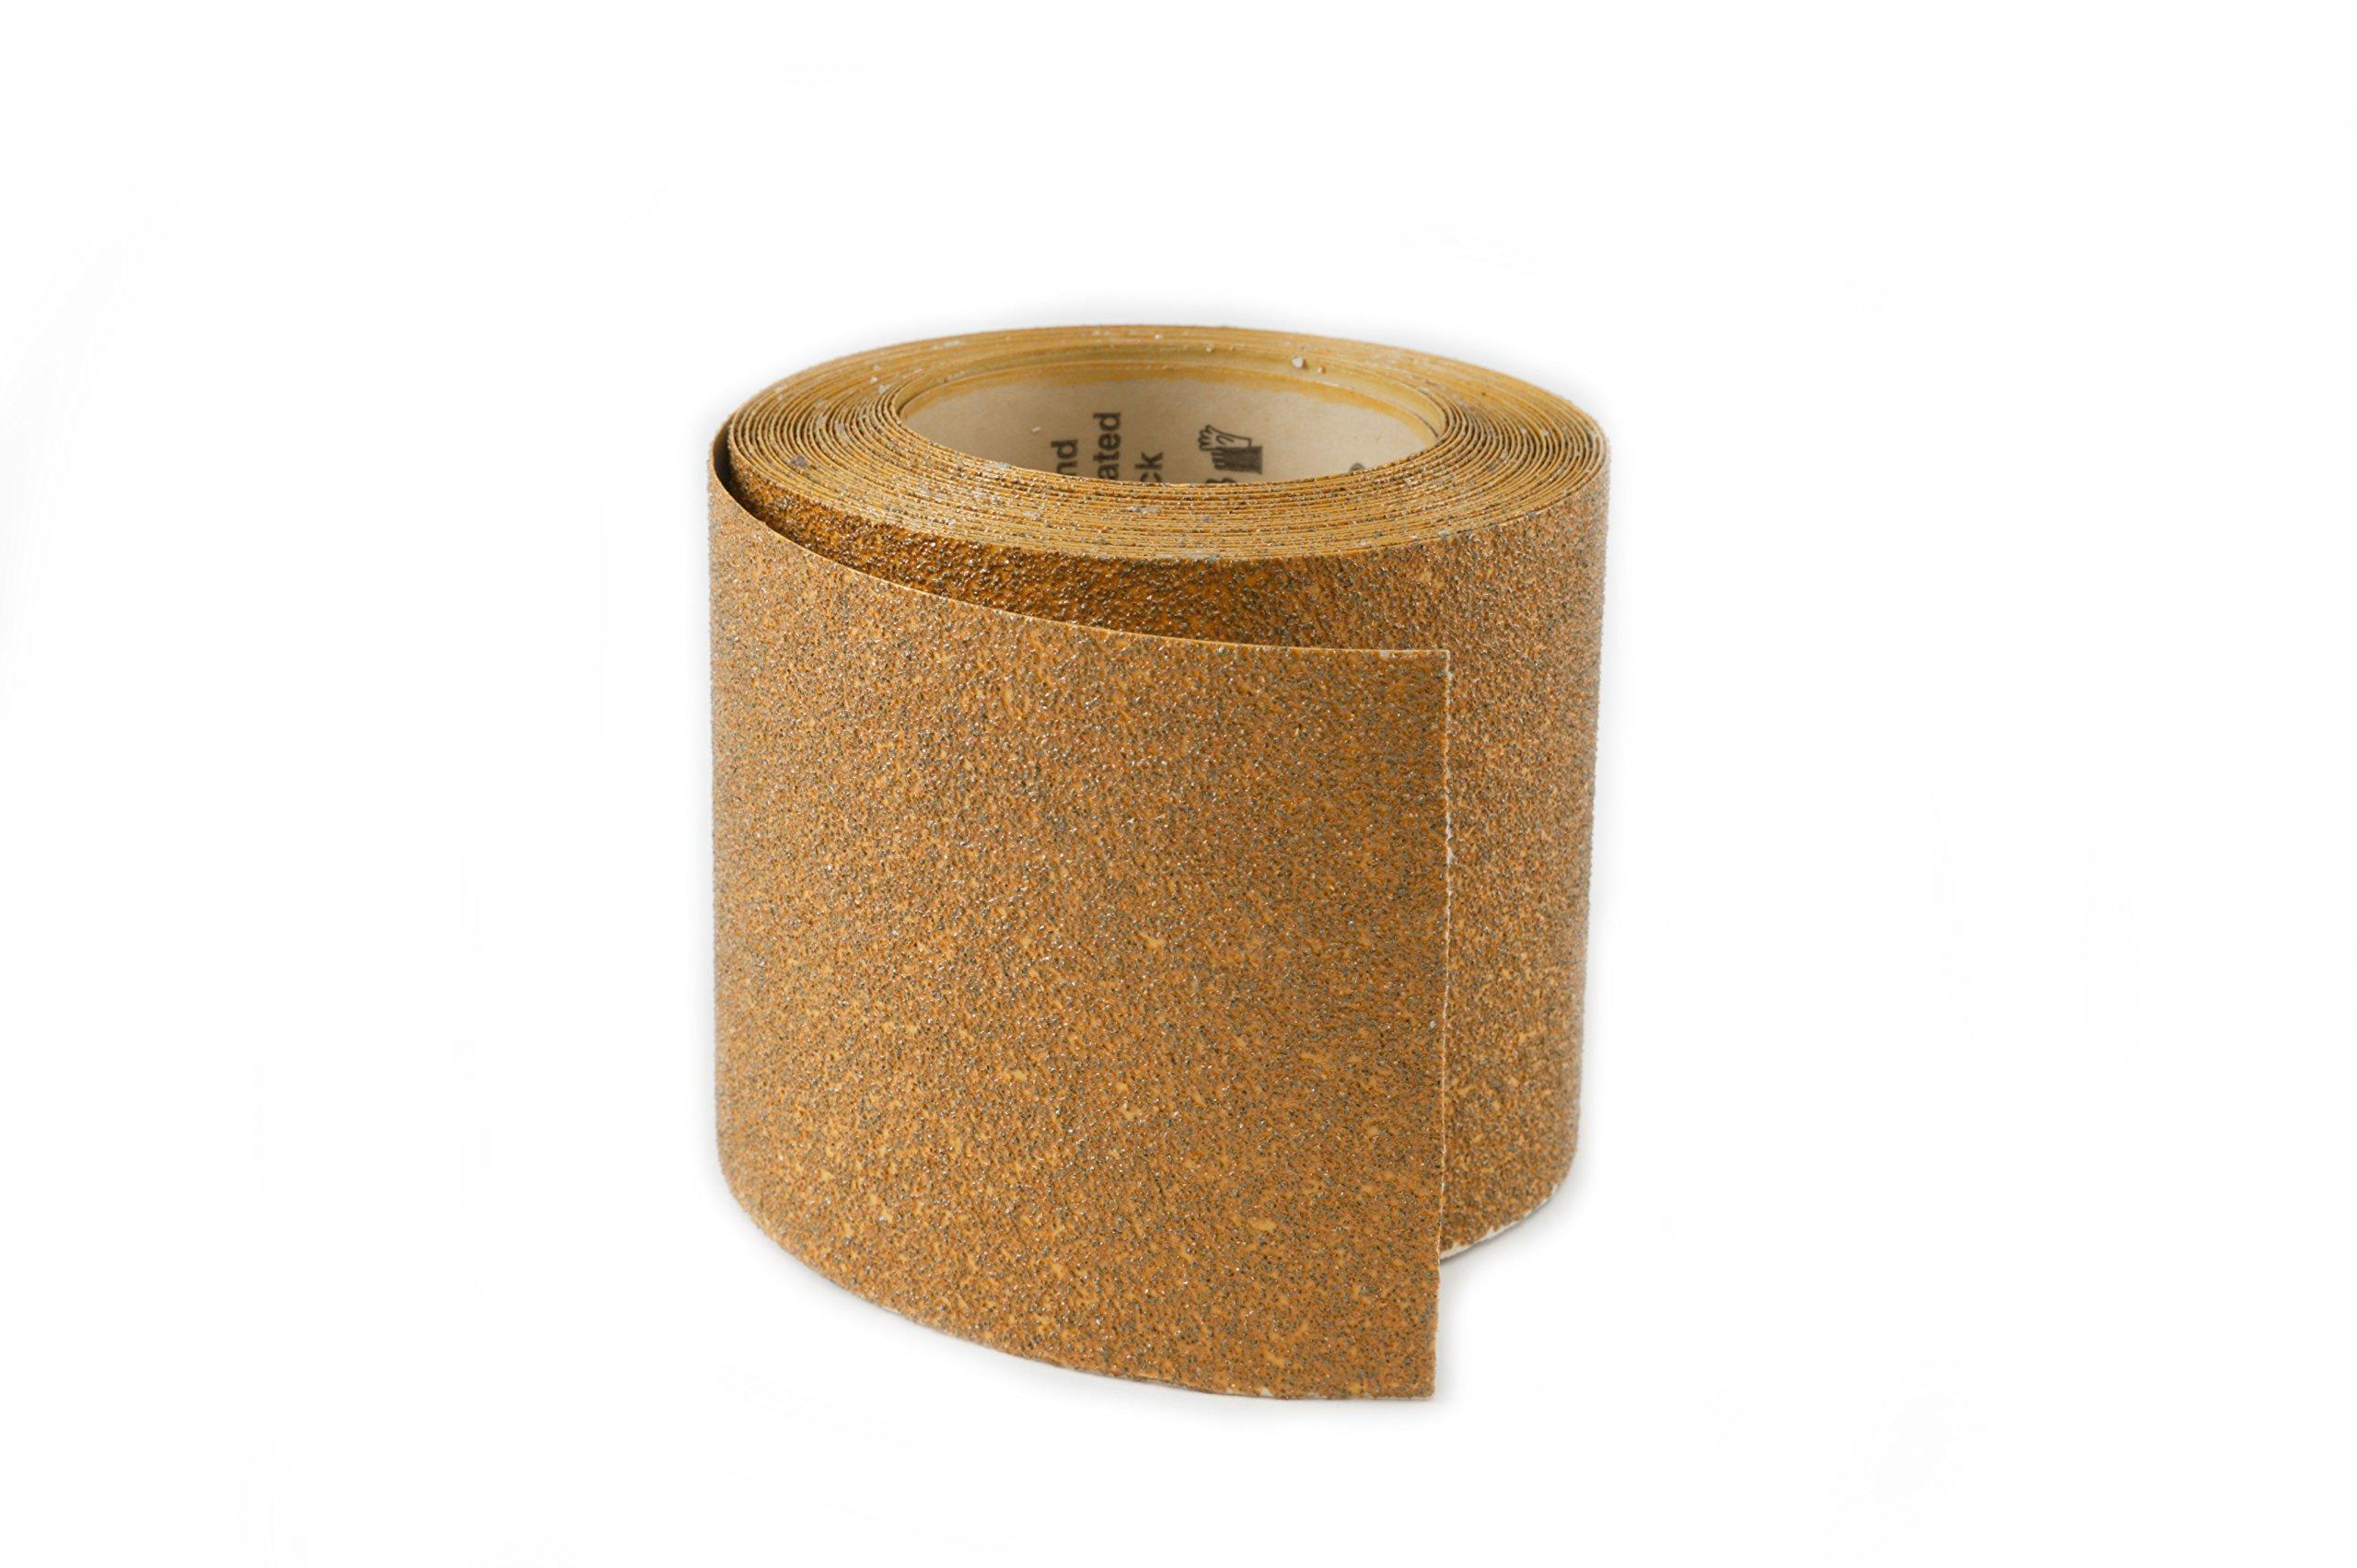 Karebac RHW40 PSA Sticky Back 40 Grit Gold Heavyweight Aluminum Oxide Rolls, 4-1/2'' x 10 yd